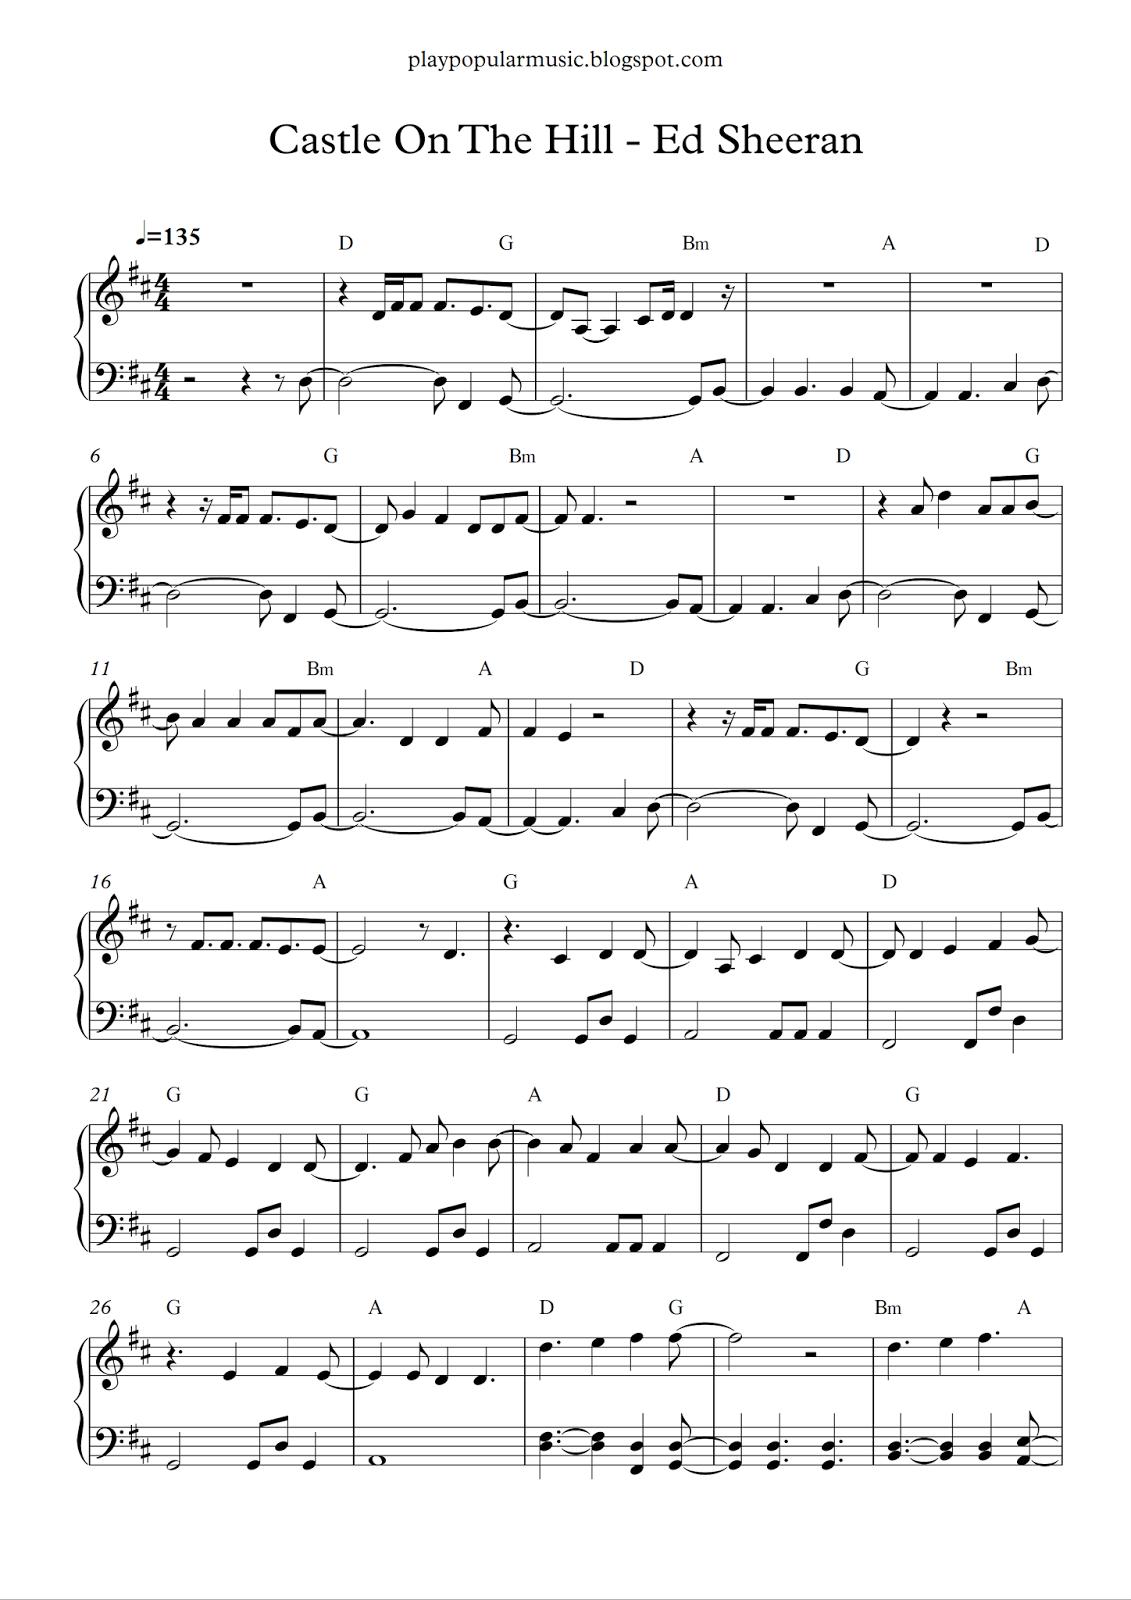 Free Piano Sheet Music Castle On The Hill Ed Sheeran Pdf I Miss The Way You Make Me Feel Piano Sheet Music Free Piano Sheet Clarinet Sheet Music